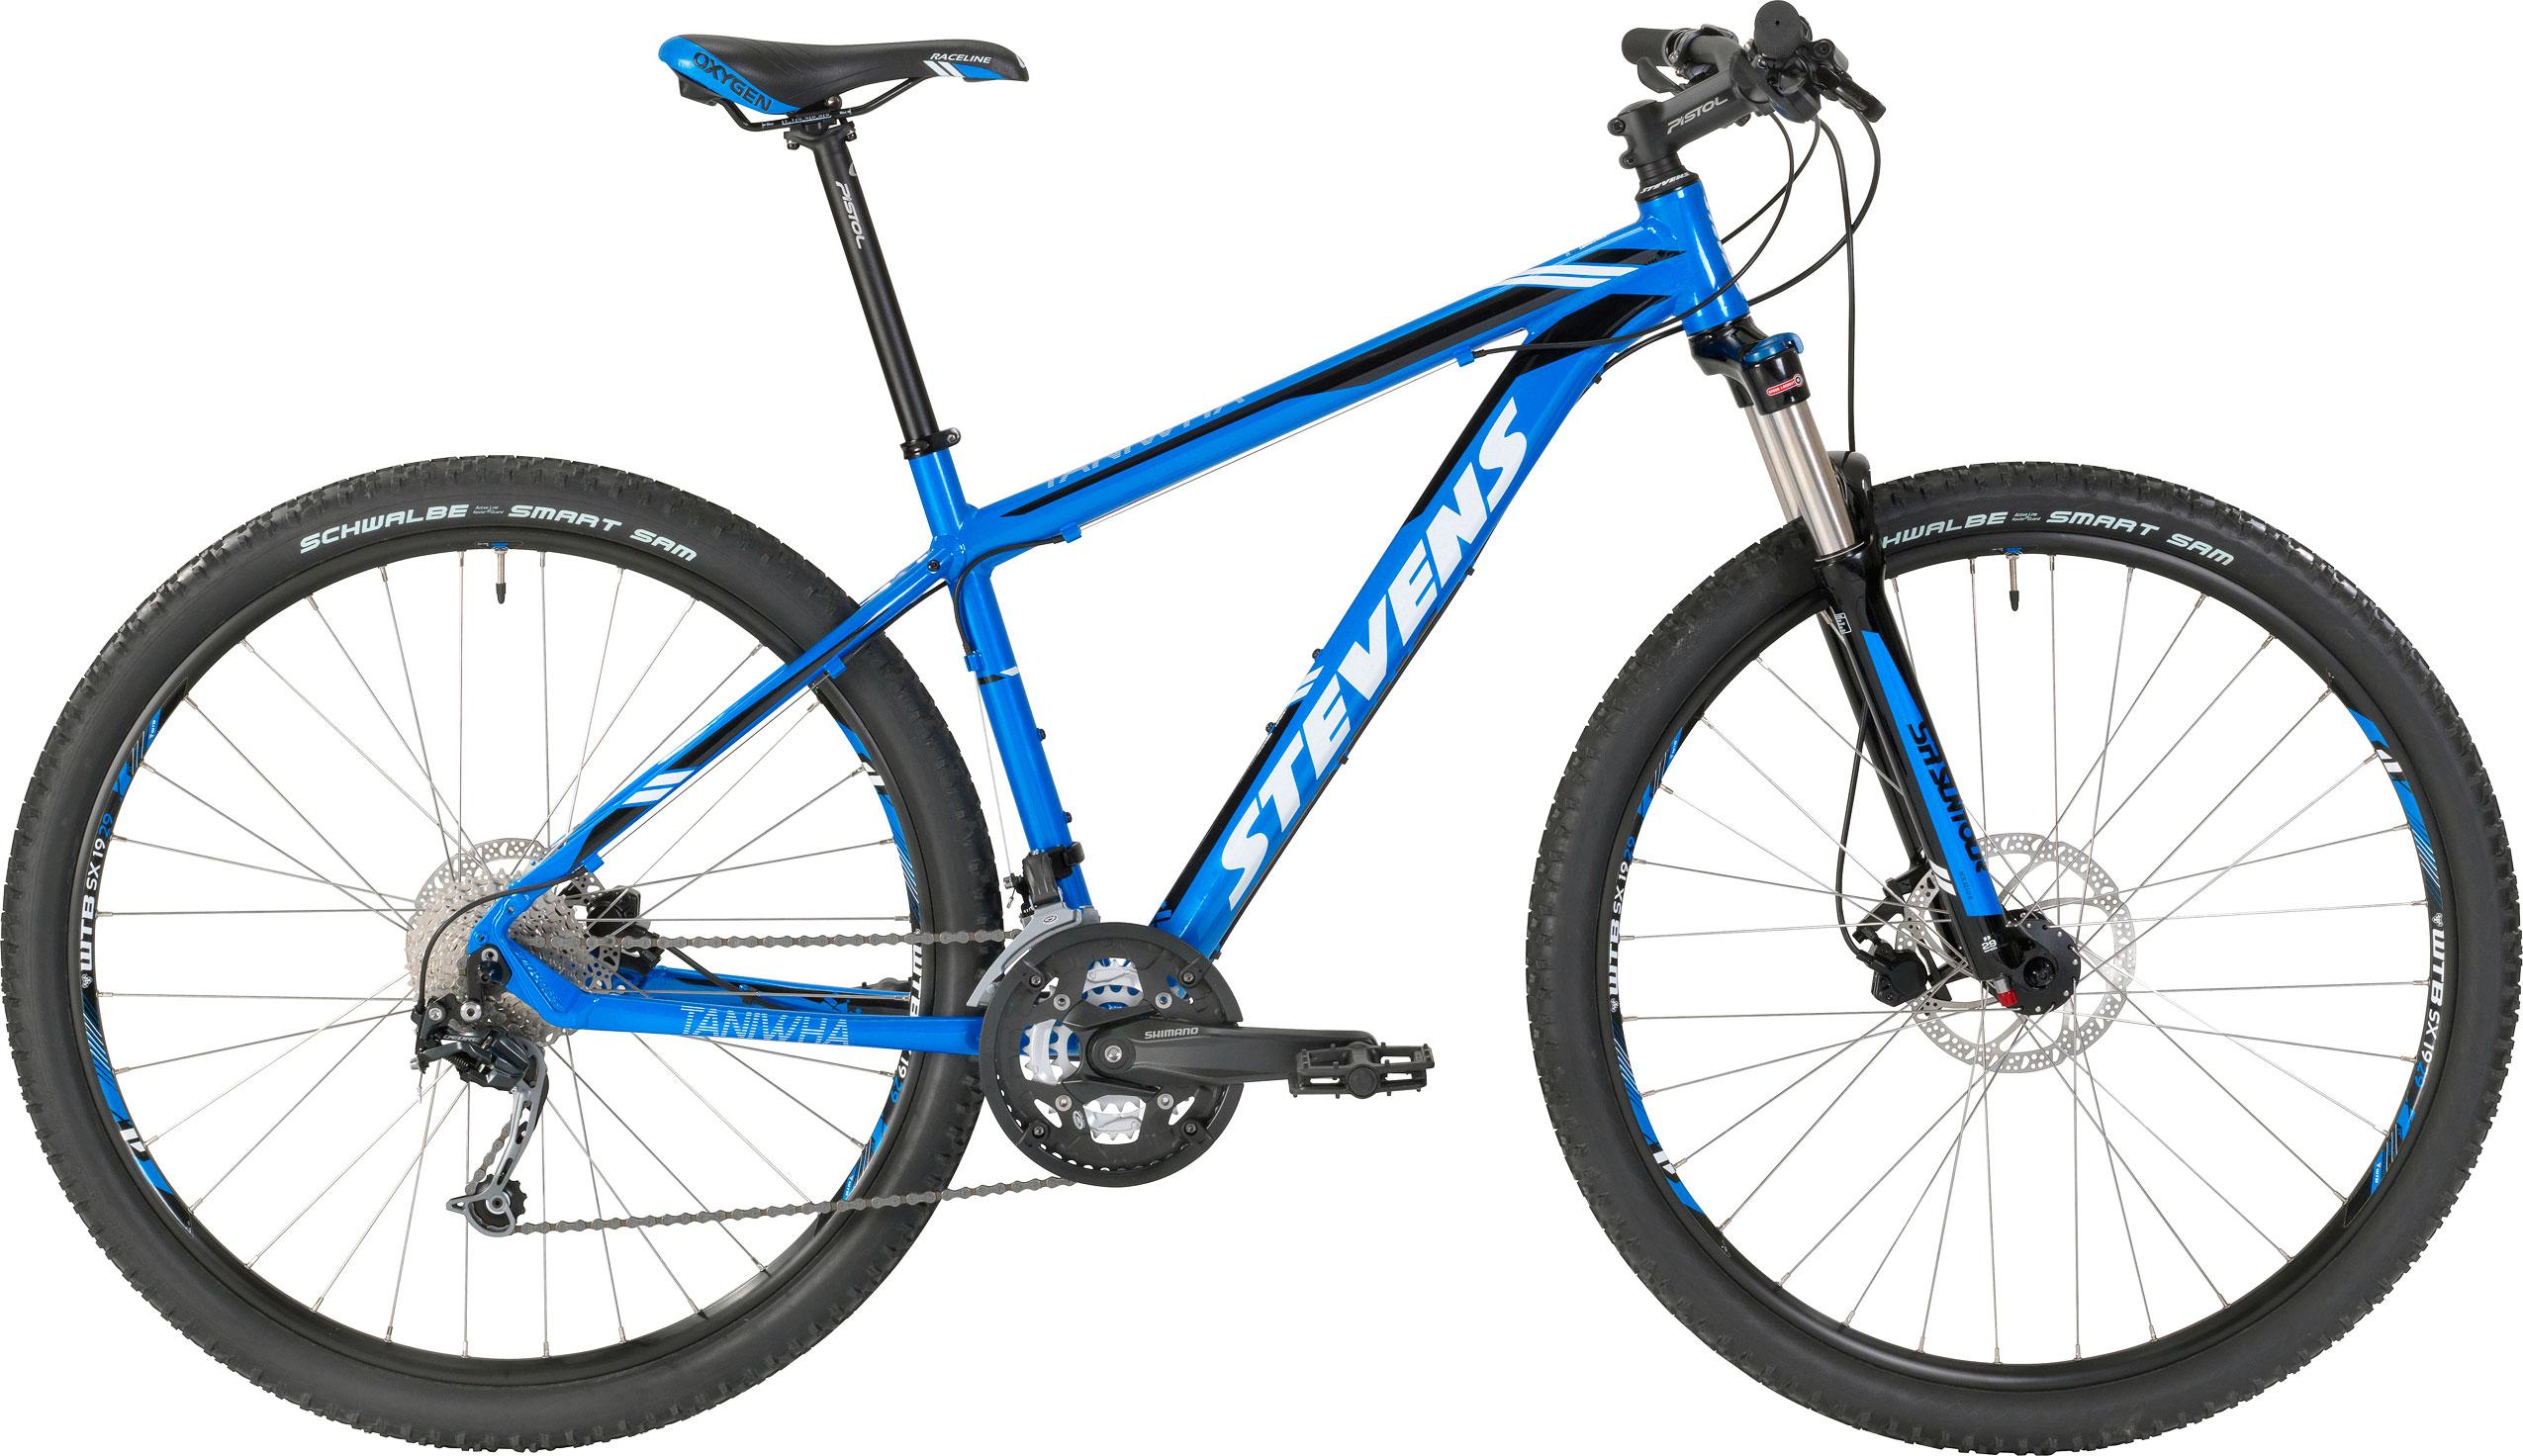 taniwha stevens bikes  taniwha